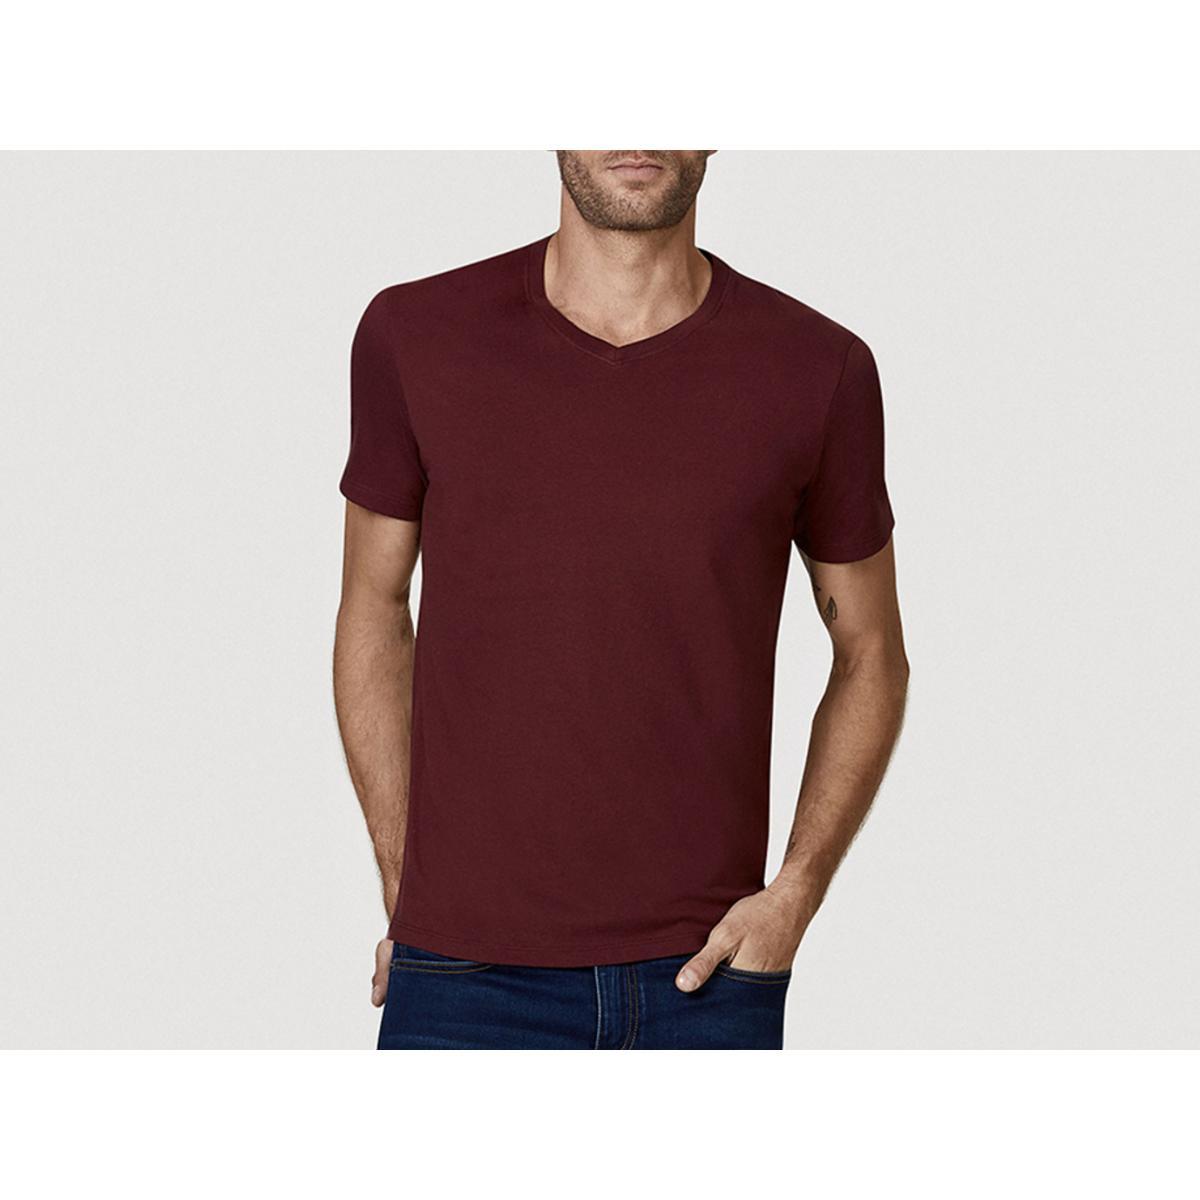 Camiseta Masculina Hering 022b Rwren Bordo